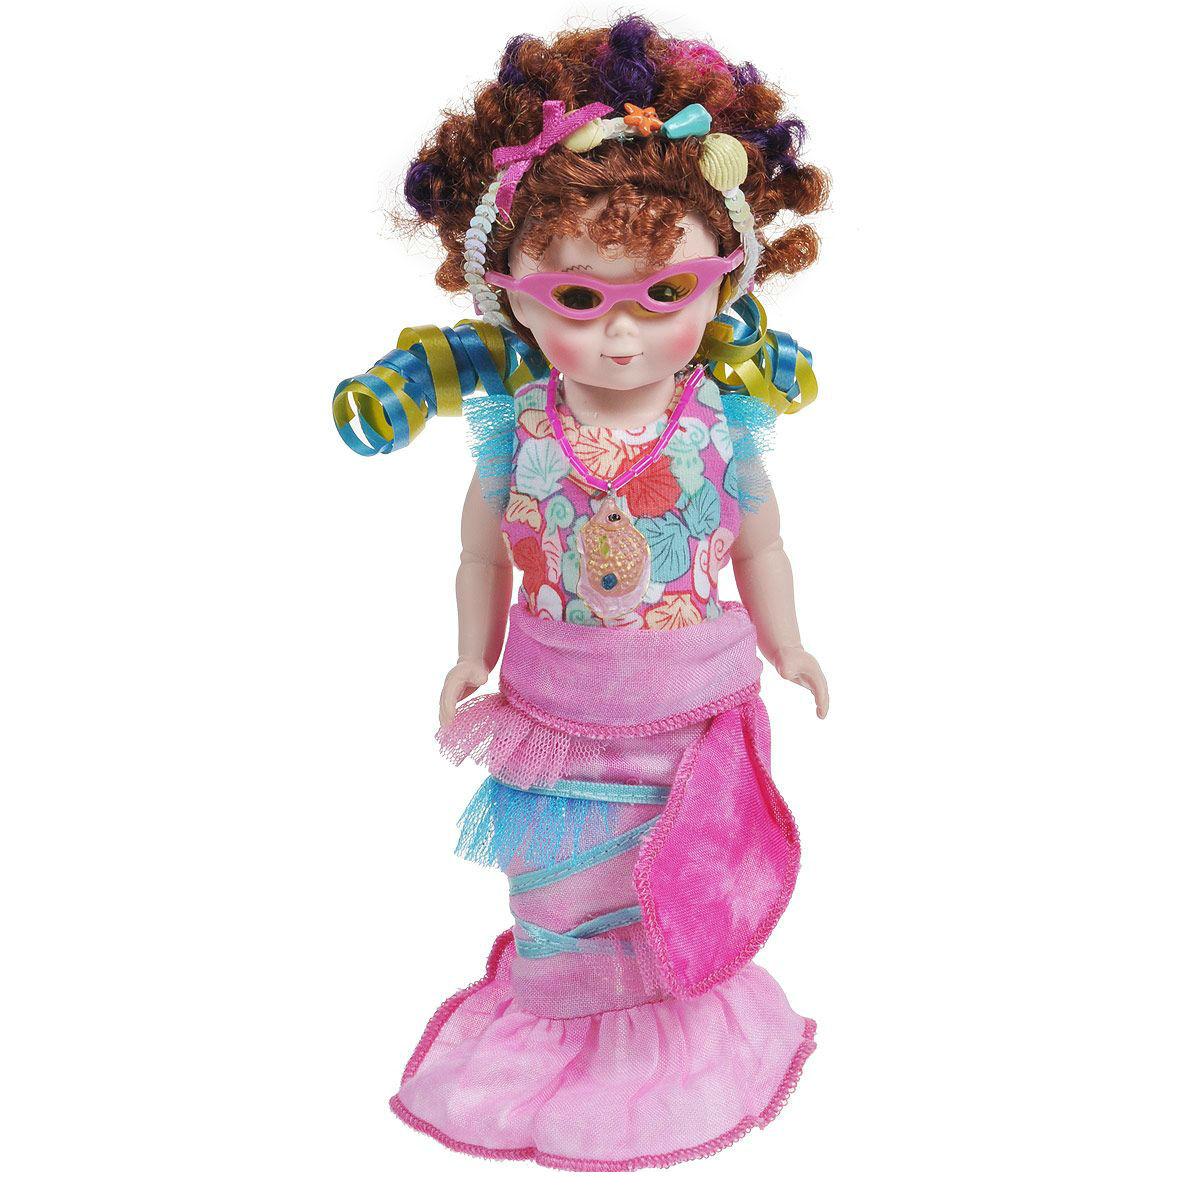 Кукла Фэнси Нэнси - русалочка, 20 смКоллекционные куклы<br>Кукла Фэнси Нэнси - русалочка, 20 см<br>